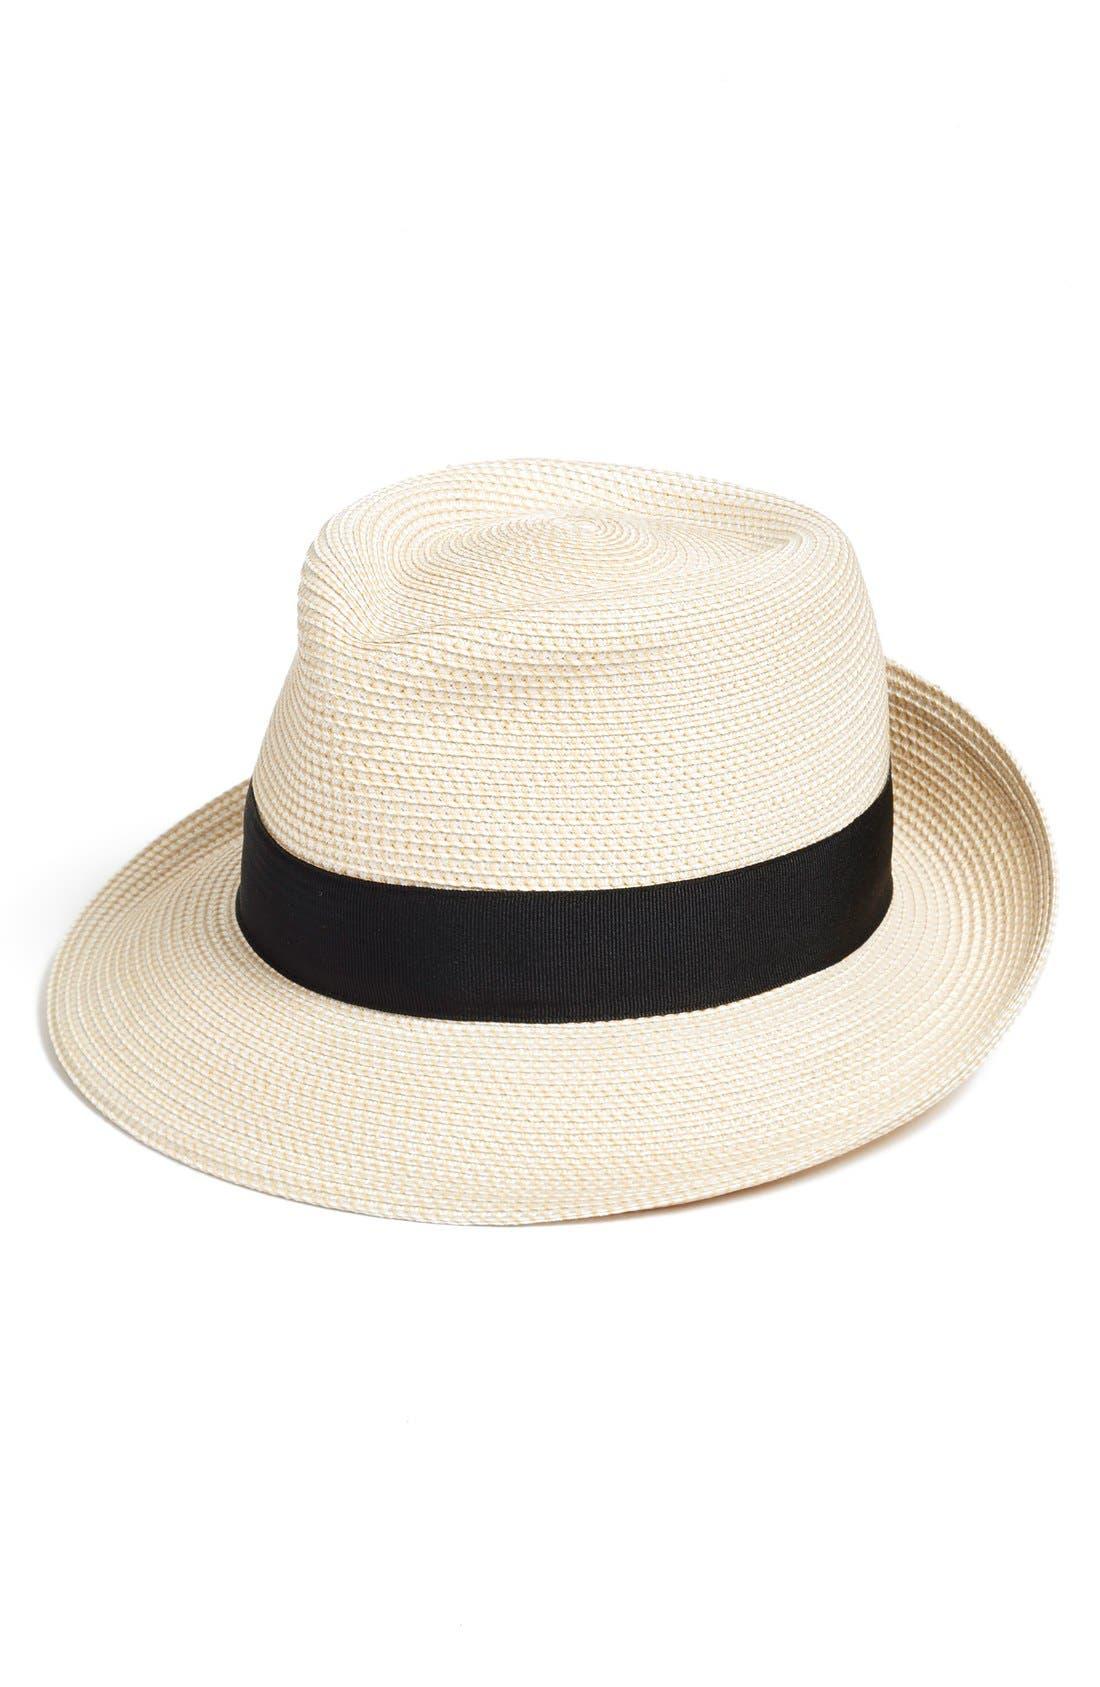 Main Image - Eric Javits 'Classic' Squishee® Packable Fedora Sun Hat